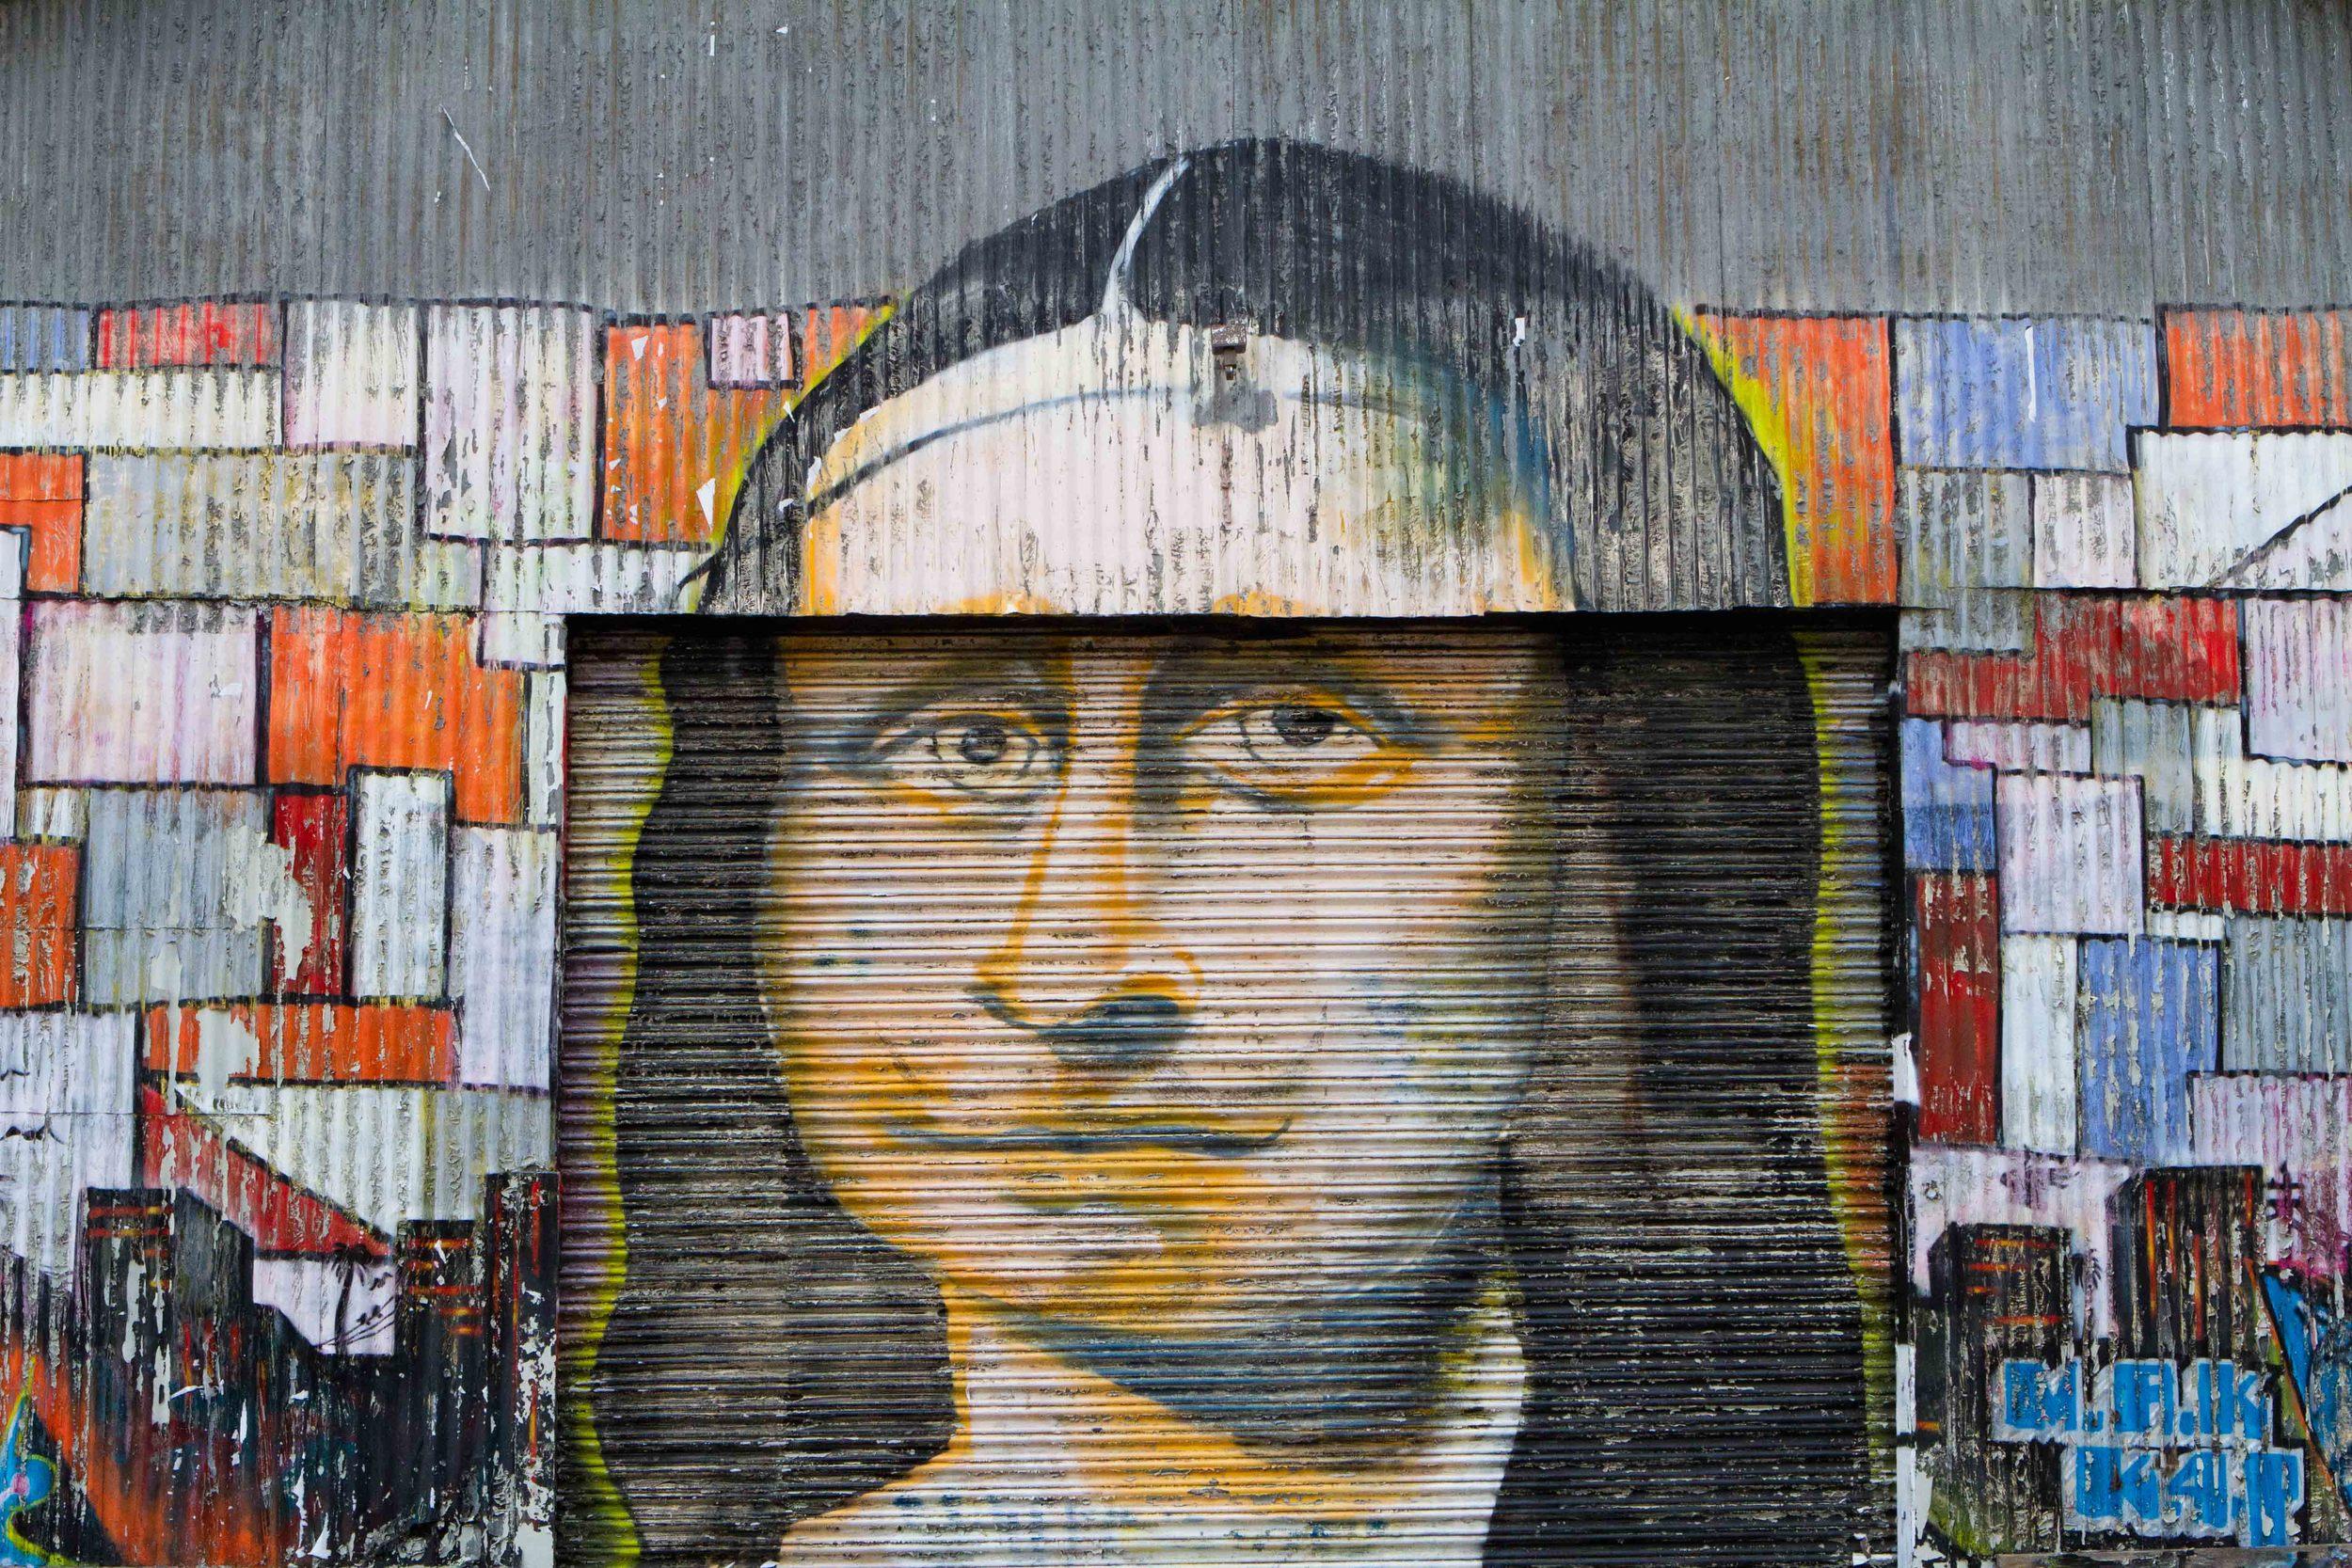 Da Vinci - Street Art - Kyle Rea Photography - cREAtive Castle Studios.jpg